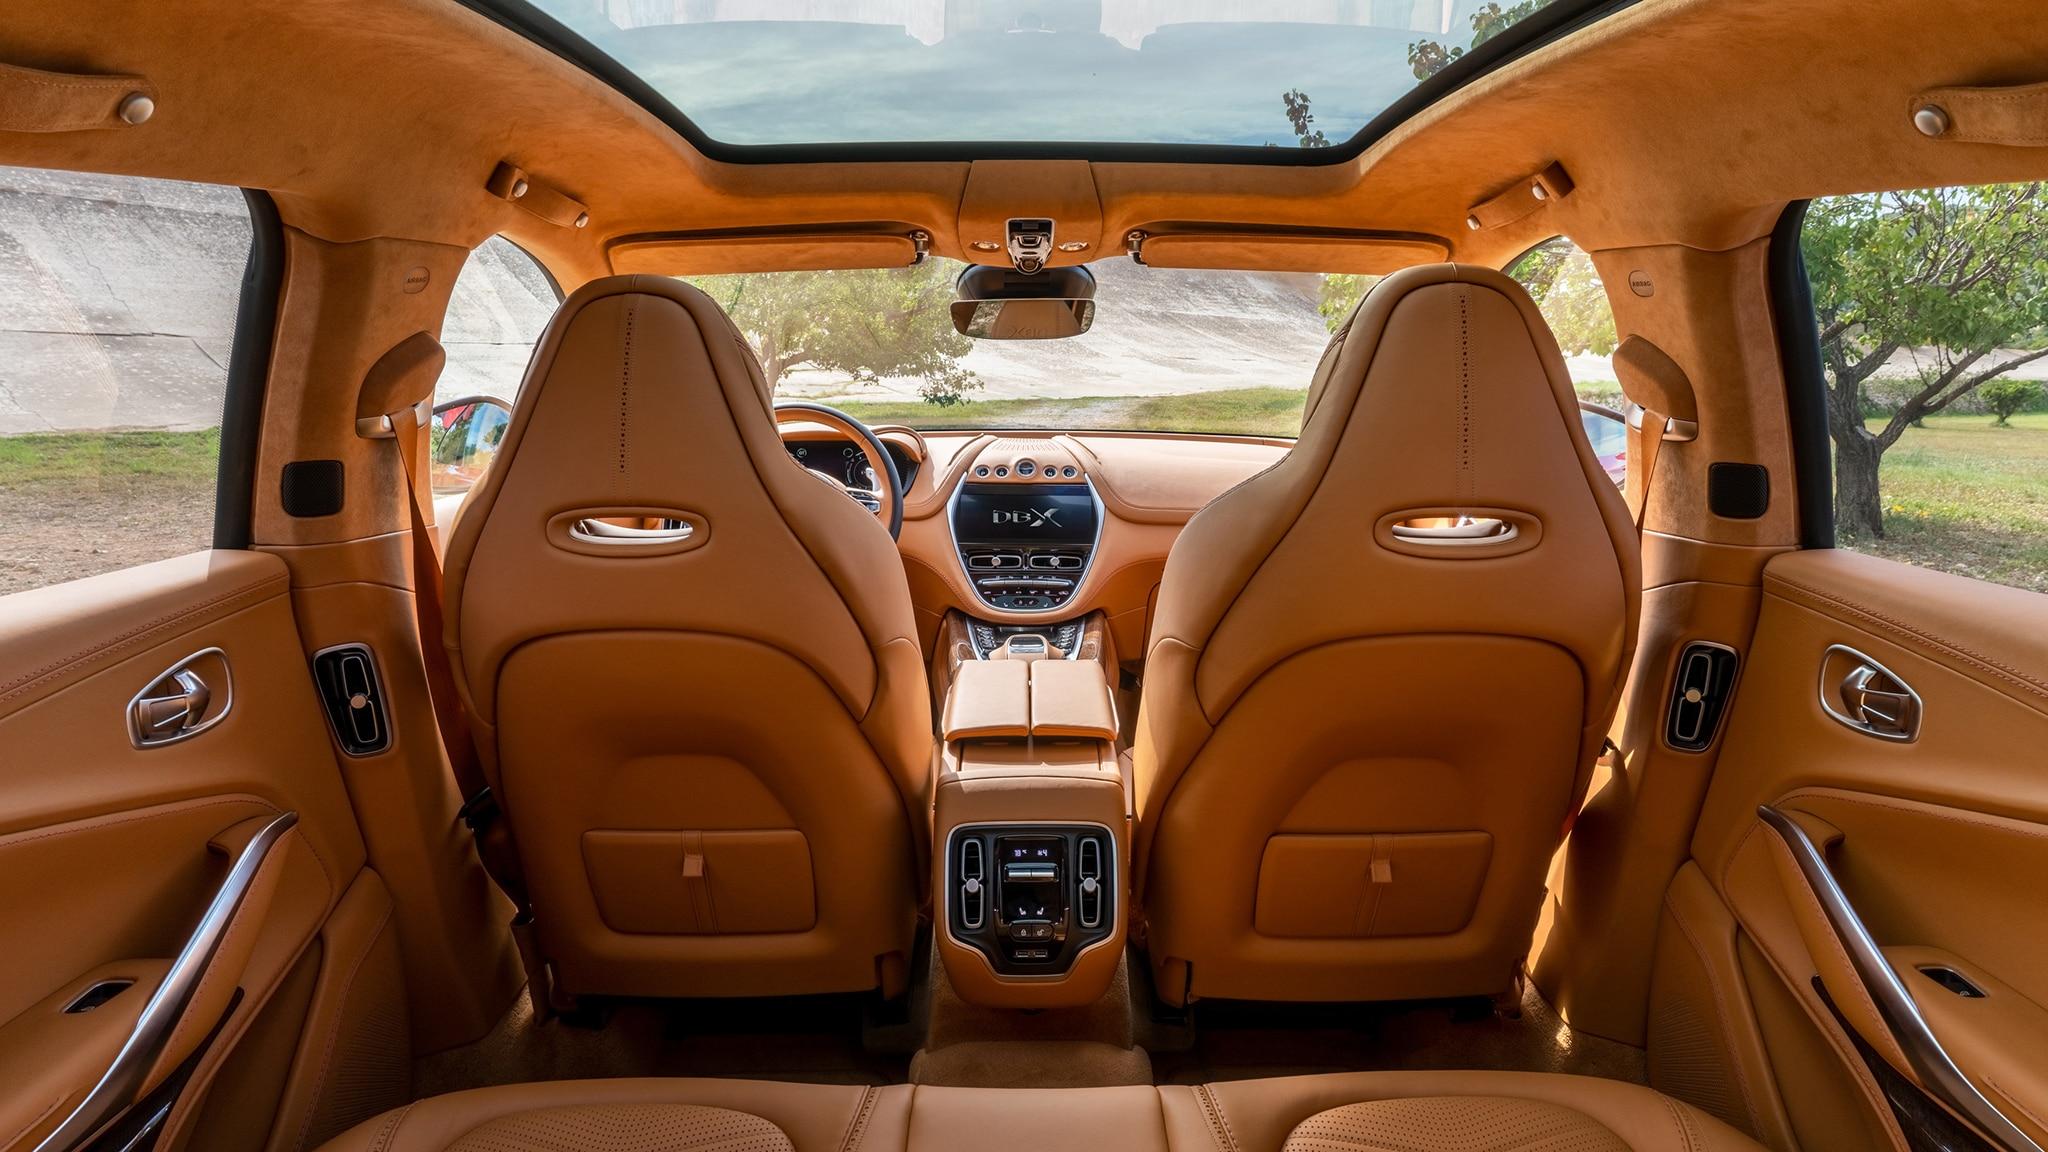 Grand Wagoneer 2018 >> Aston Martin DBX SUV: Price, First Interior Image Released | Automobile Magazine - Automobile